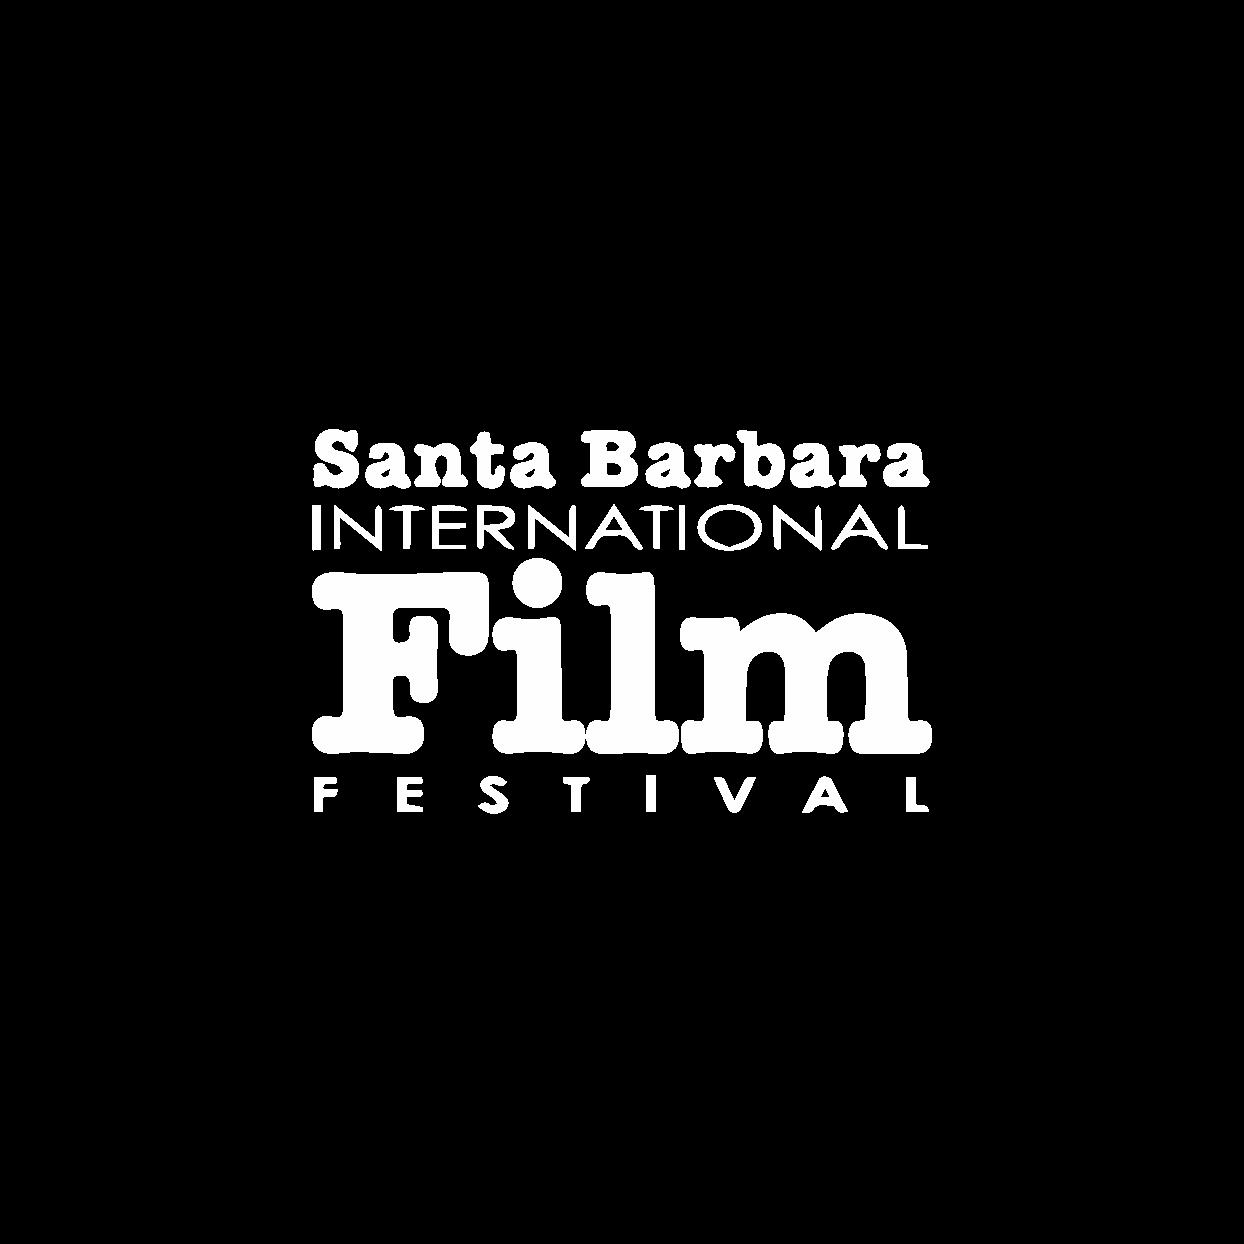 logo-SBIFF-white@2x.png